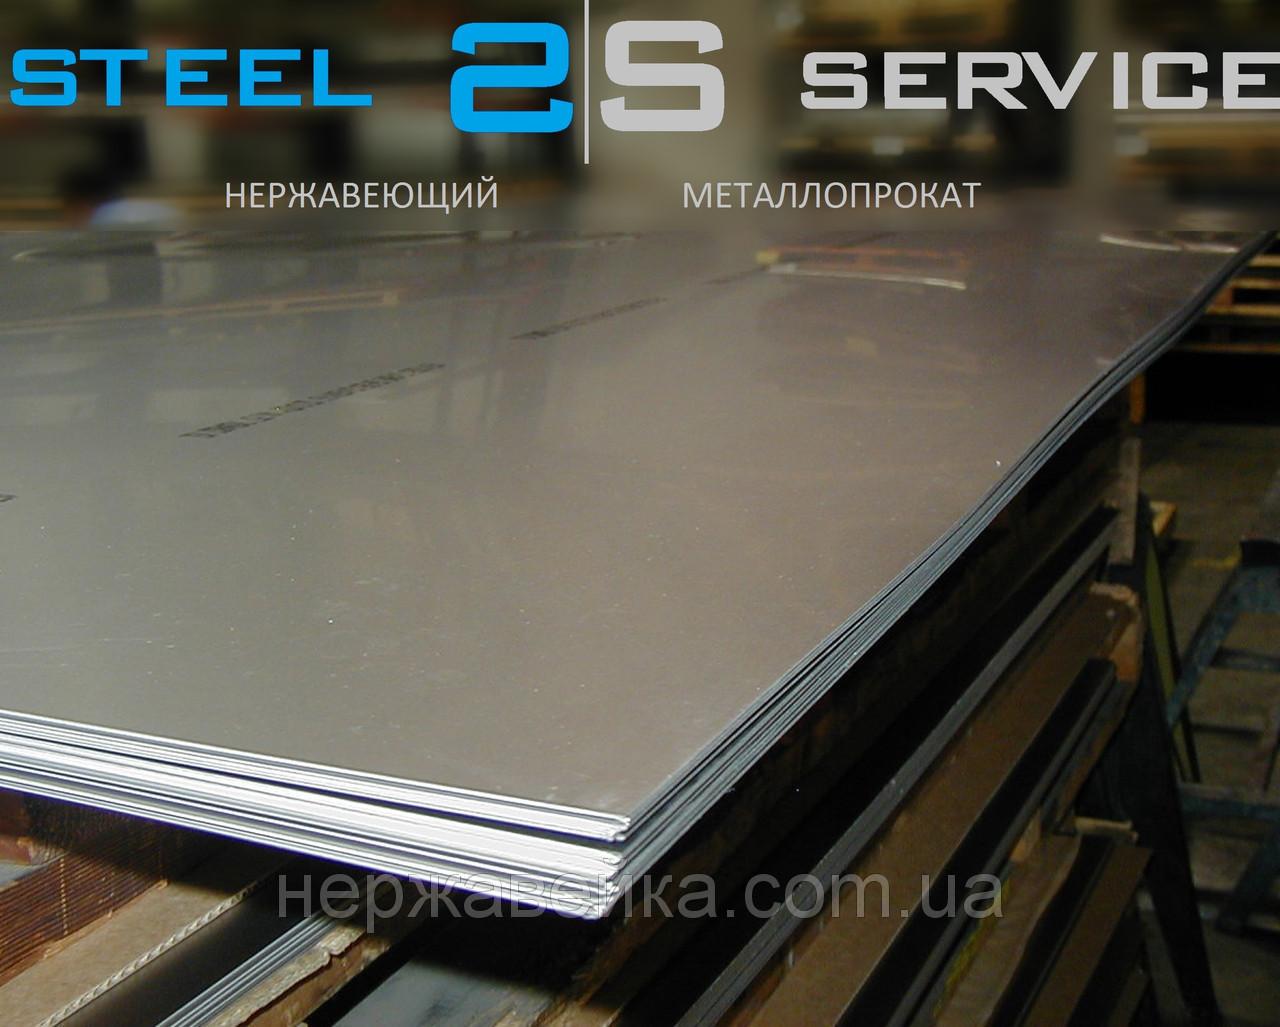 Нержавейка лист 8х1500х6000мм  AISI 316Ti(10Х17Н13М2Т) F1 - горячекатанный,  кислотостойкий